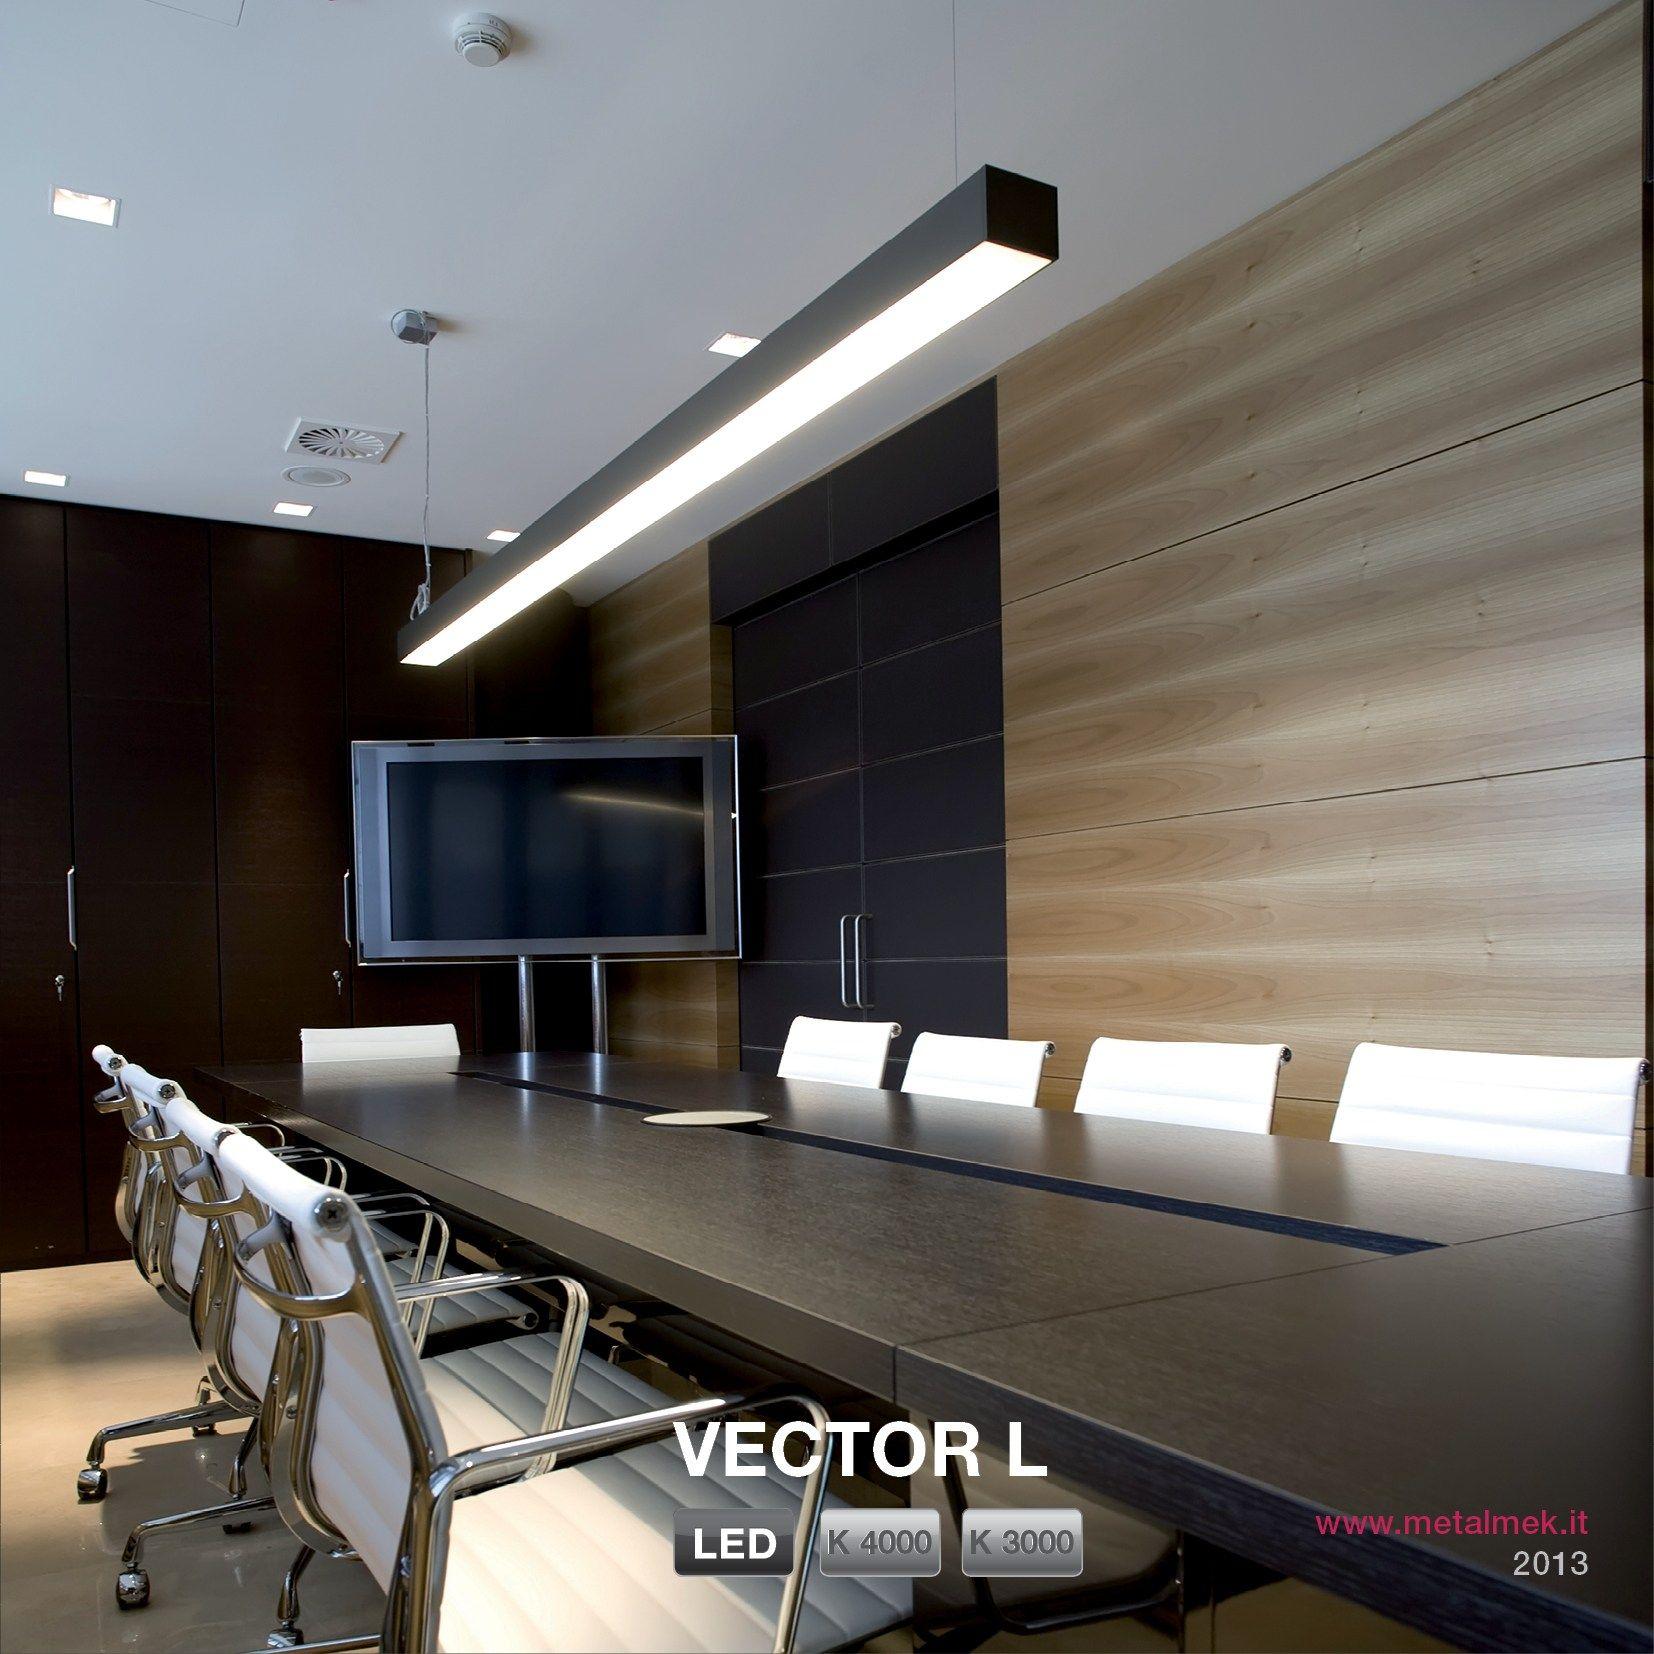 VECTOR L LED LED pendant lamp by METALMEK ILLUMINAZIONE